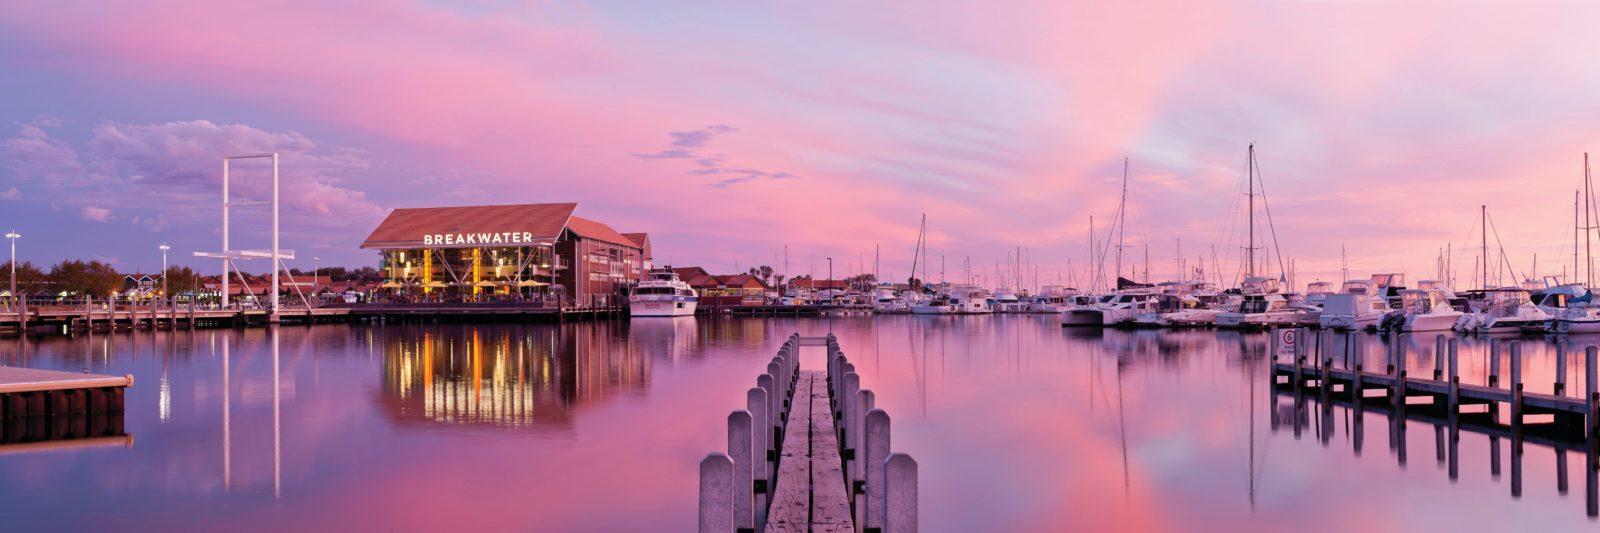 Hillarys Boat Harbour, Sorrento Quay, Western Australia